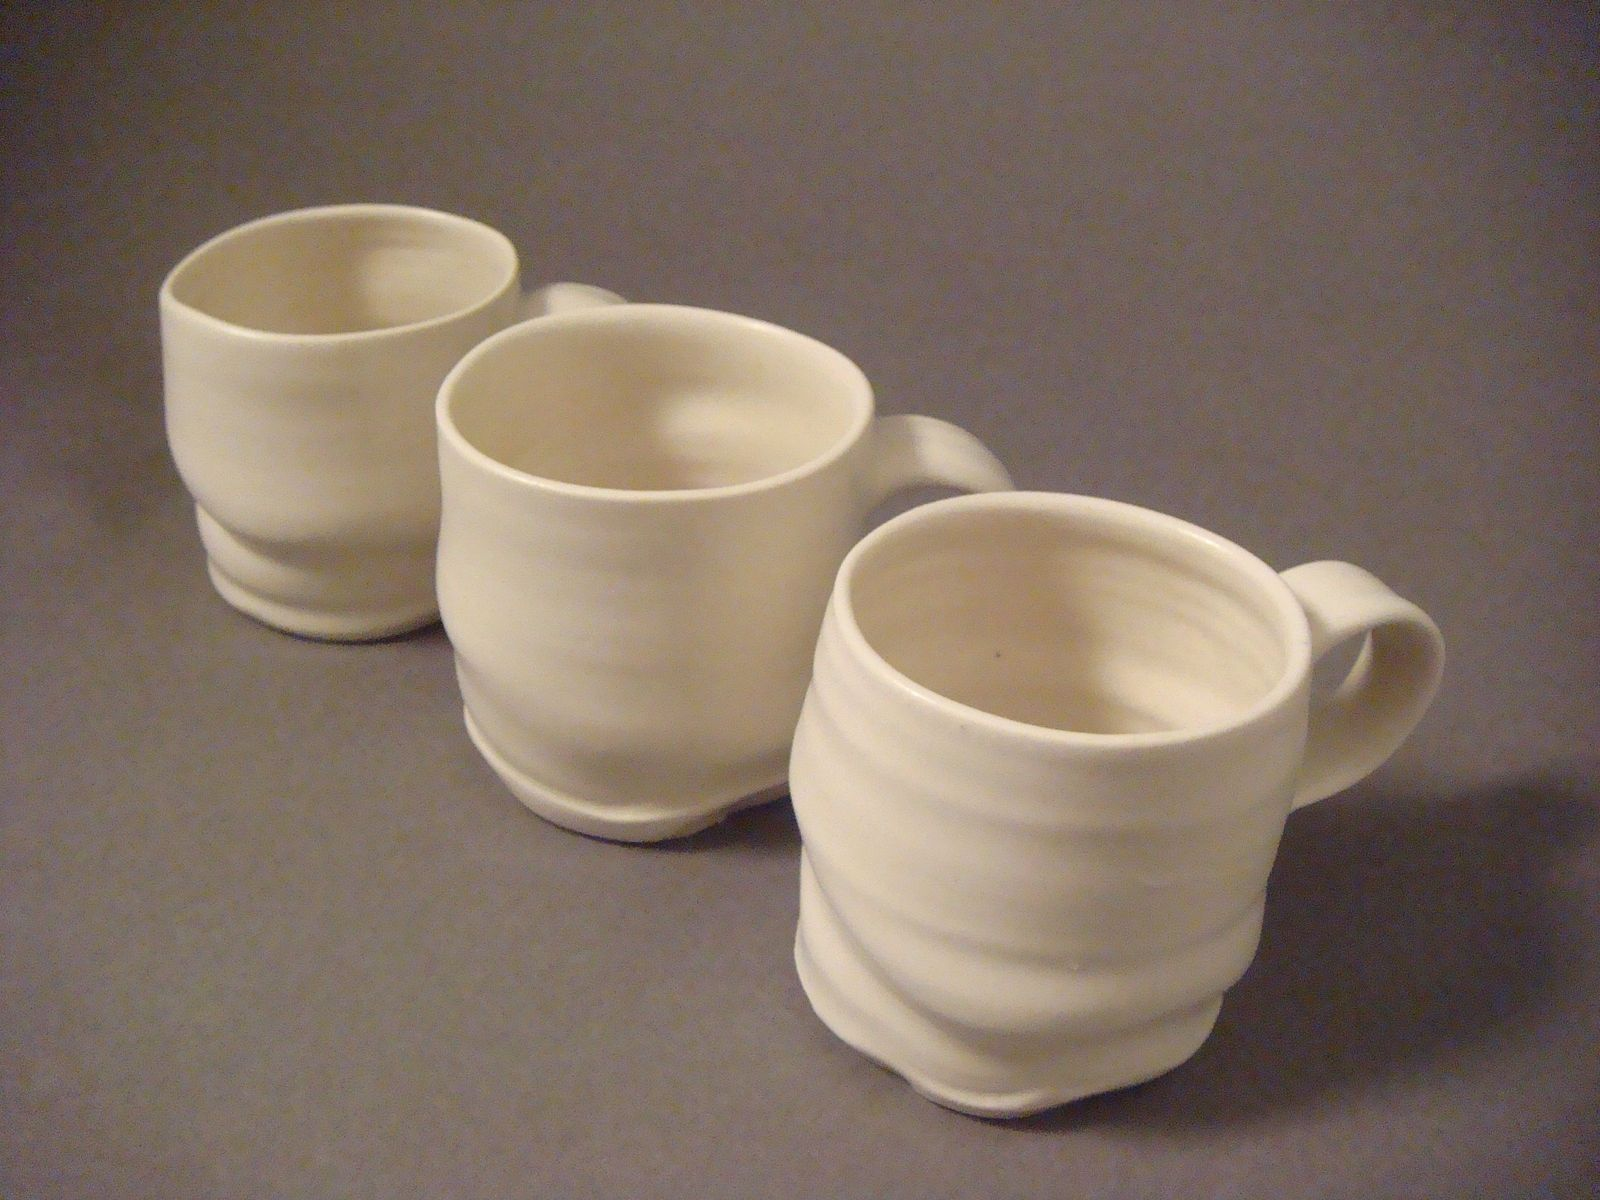 Hand Made Hand Thrown Porcelain Coffee Mugs By Elizabeth